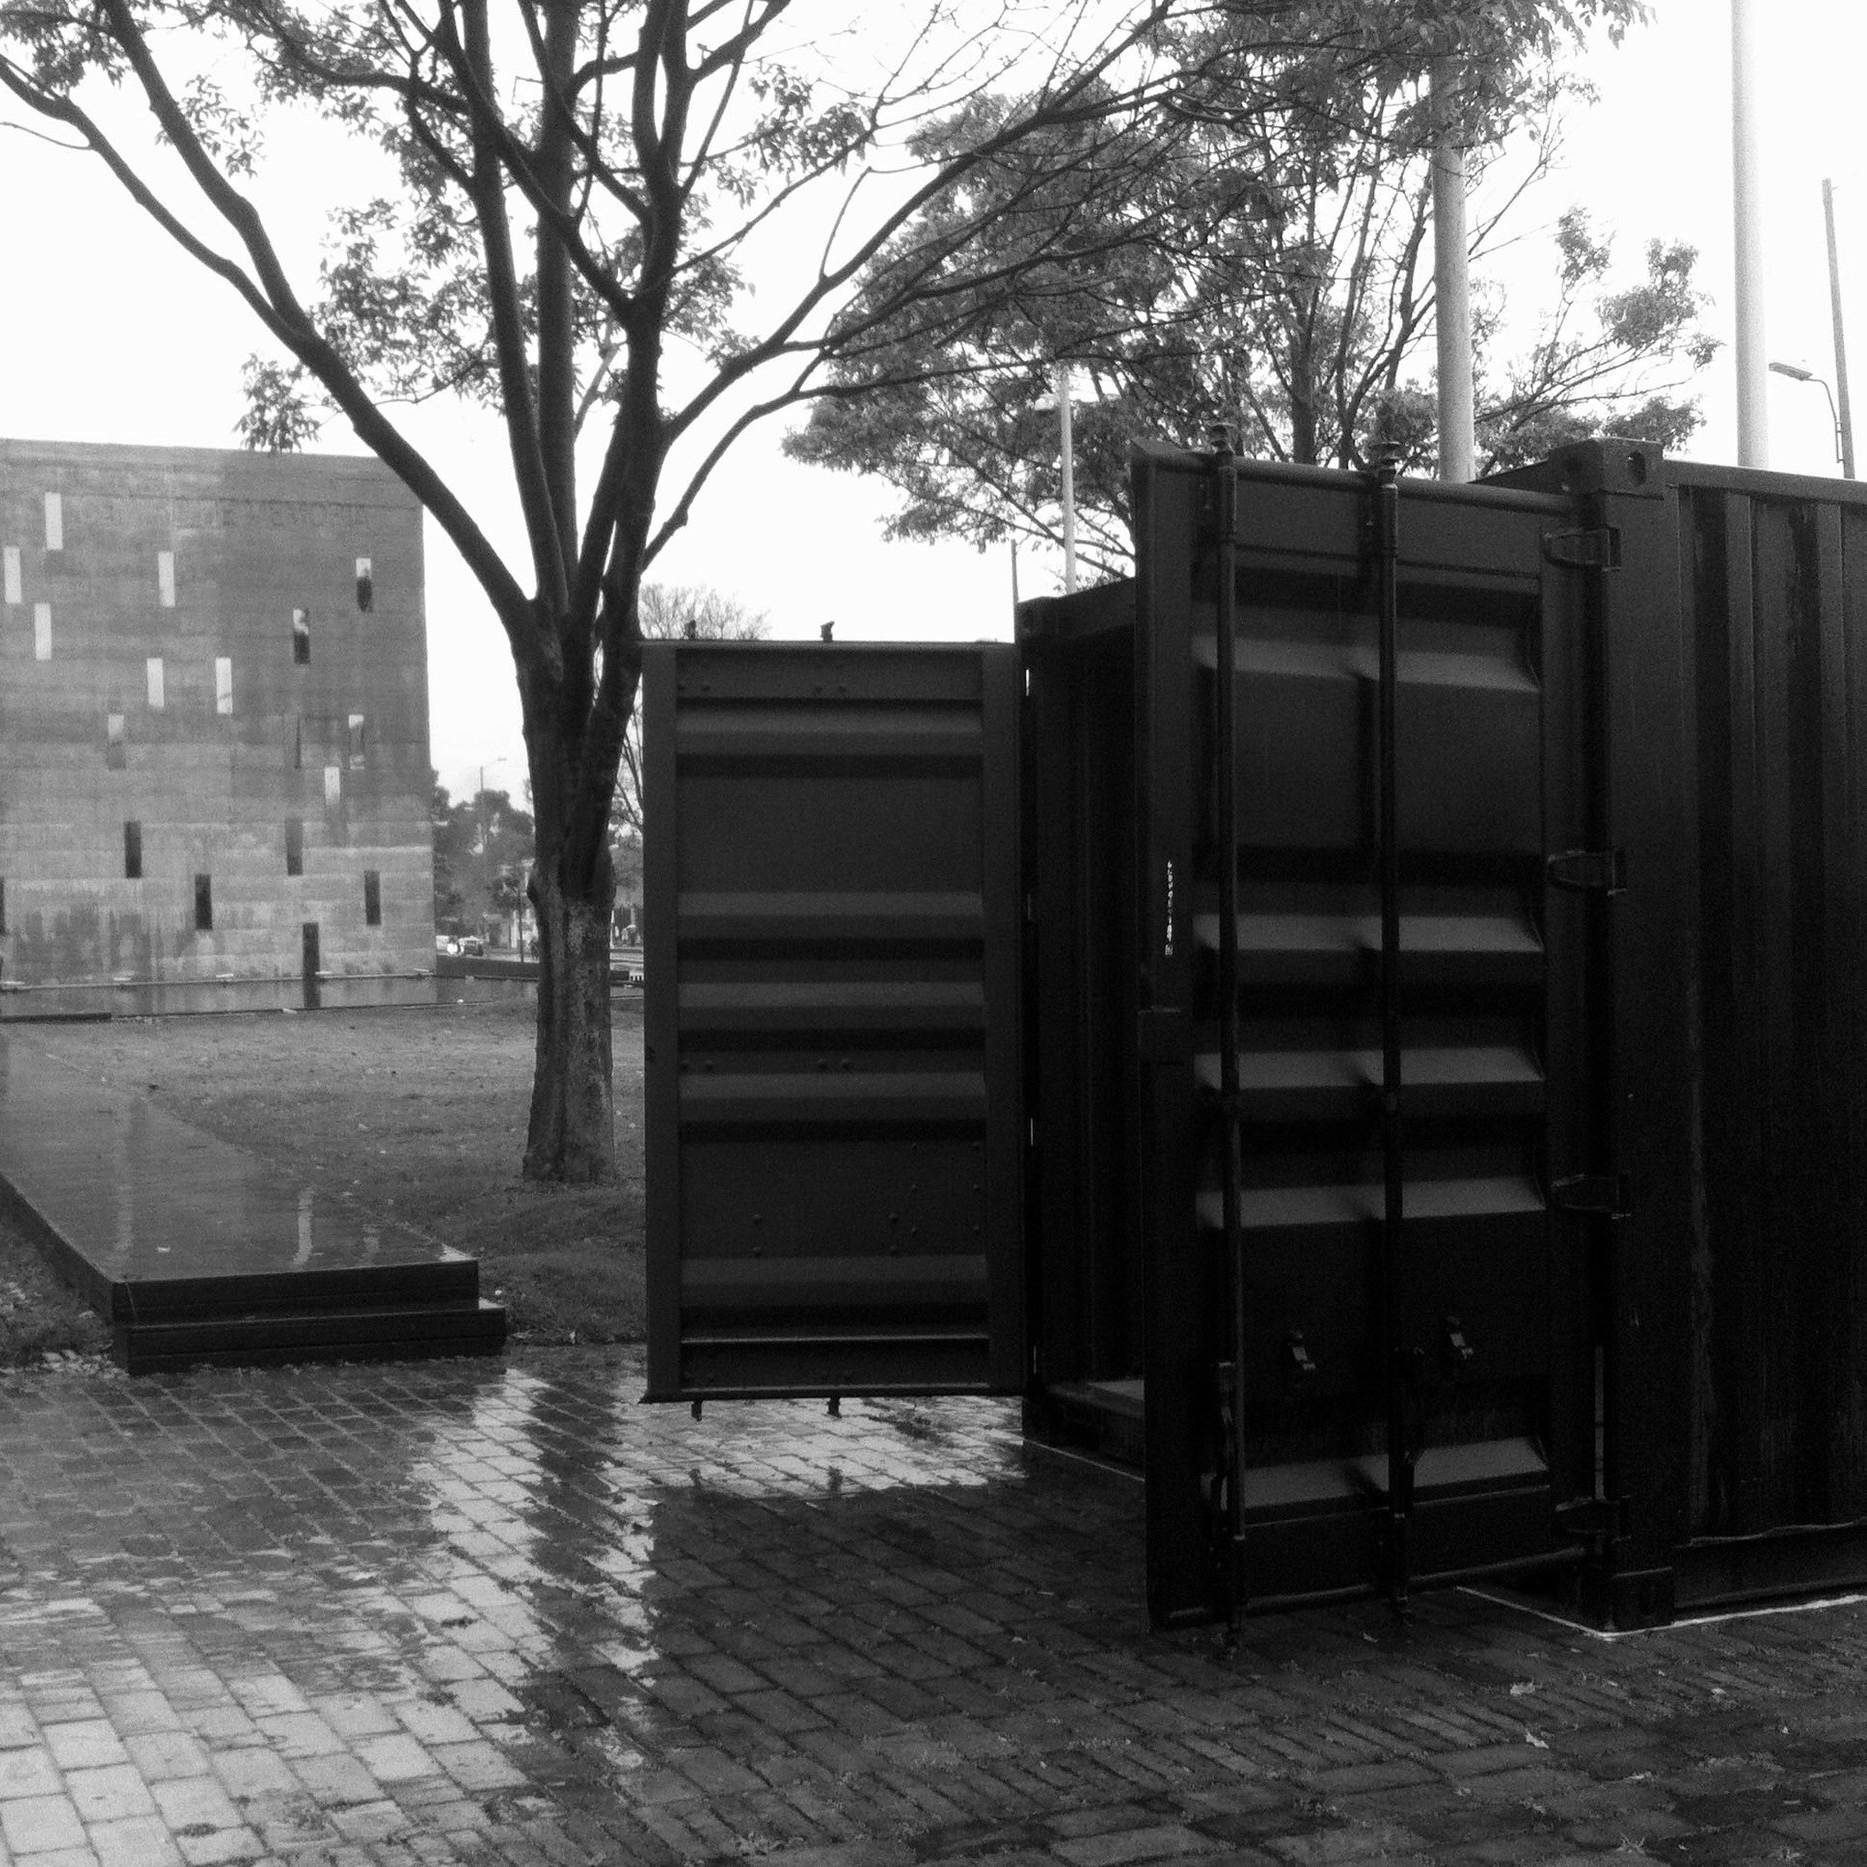 Cajan Negra: Armero - Leonel Castañeda